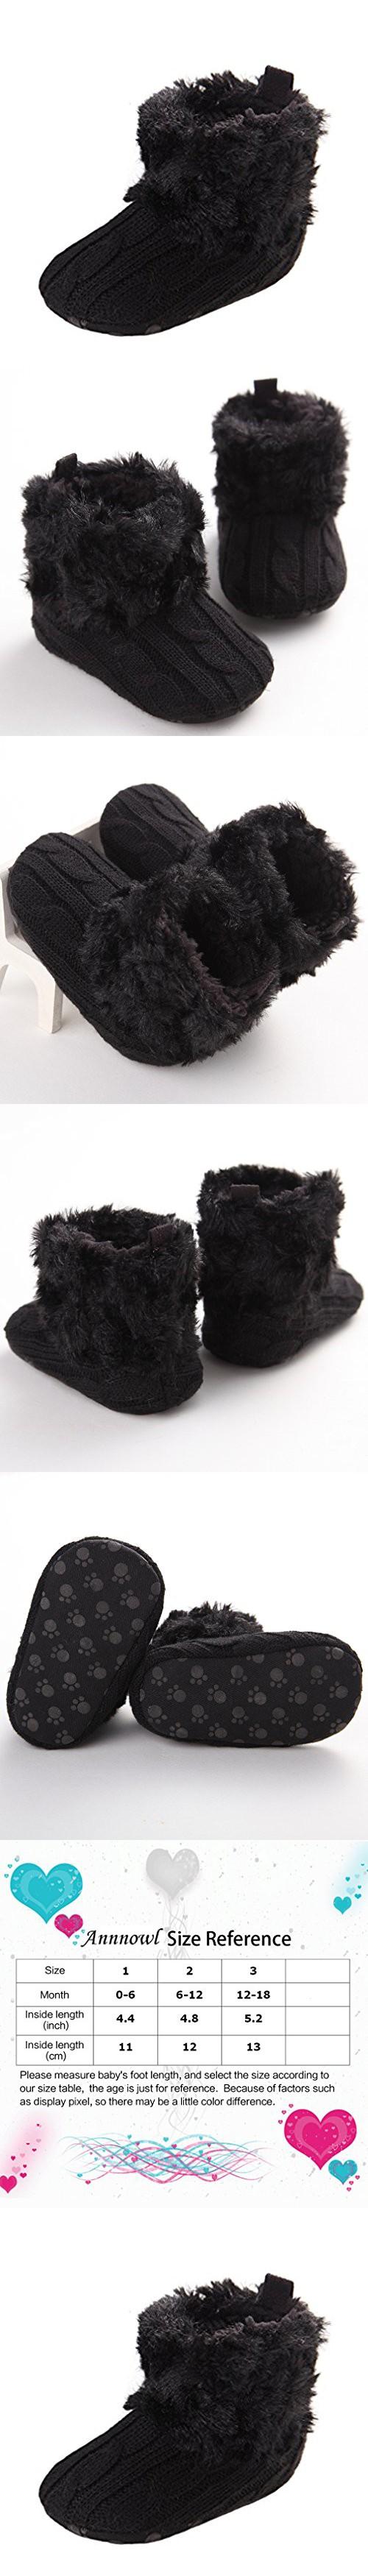 Annnowl Baby Girls Knit Soft Fur Winter Warm Snow Boots Crib Shoes 0-18 Months (6-12 Months, Black)